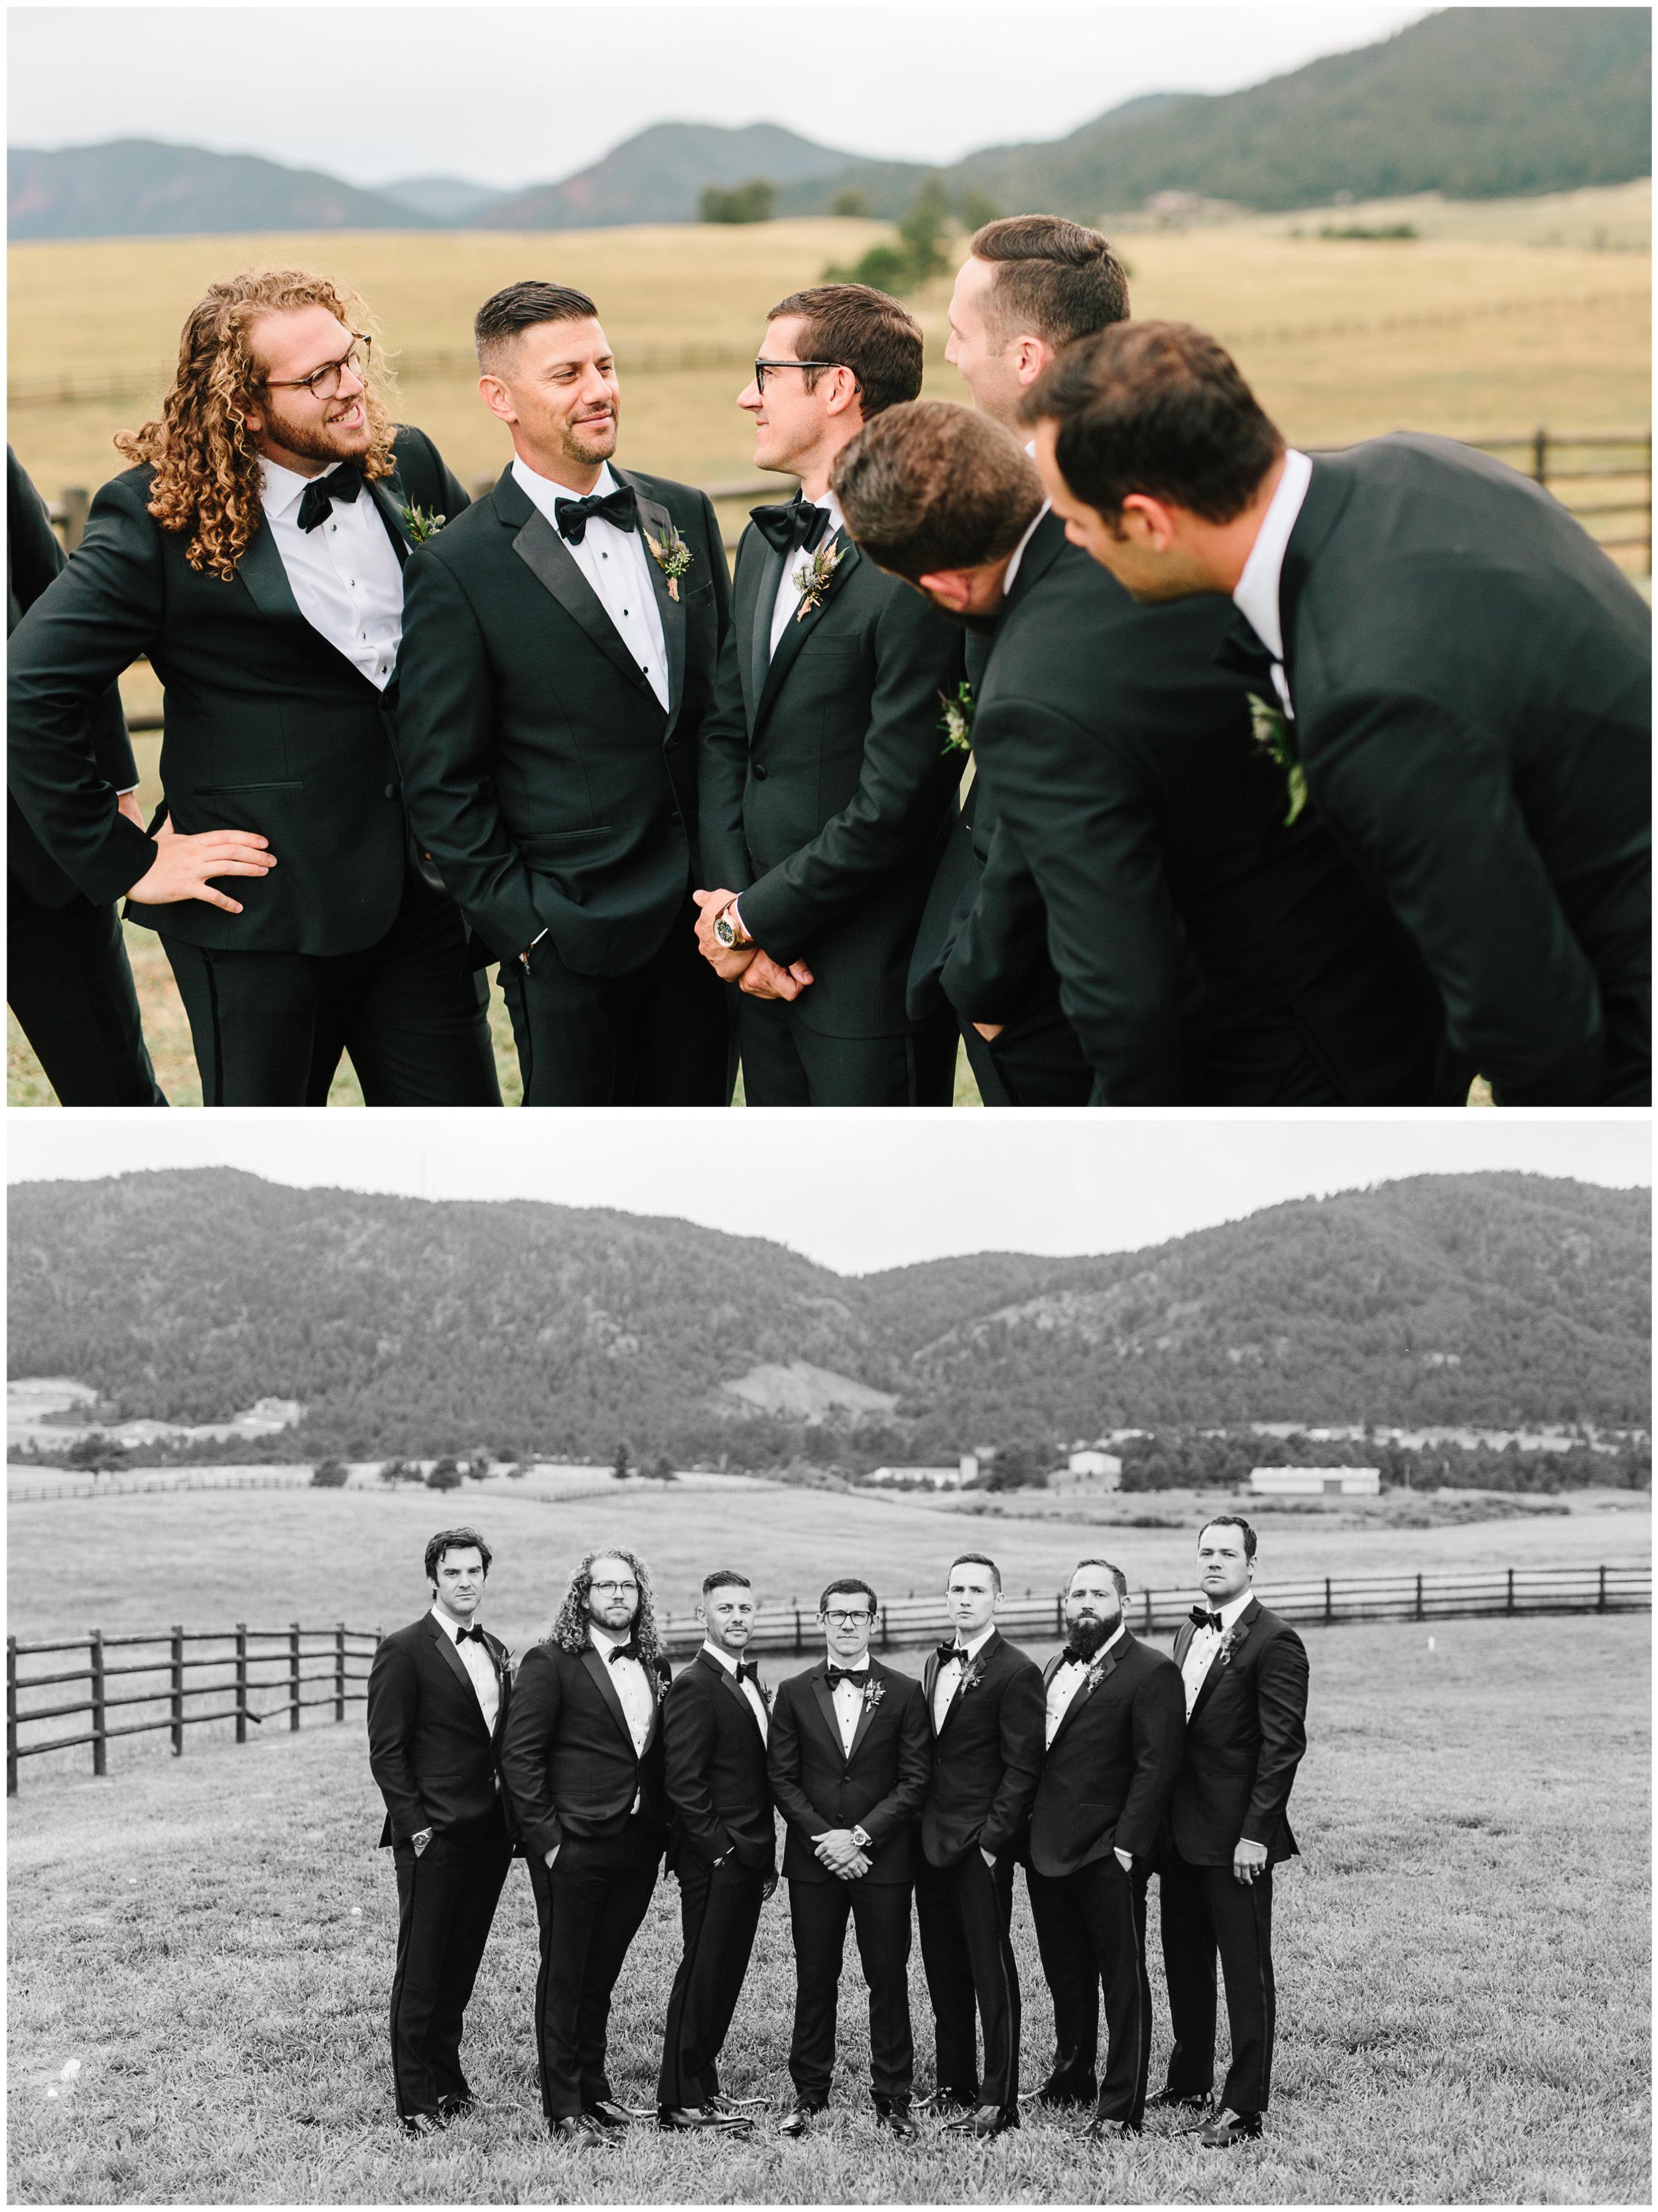 spruce_mountain_ranch_wedding_42.jpg